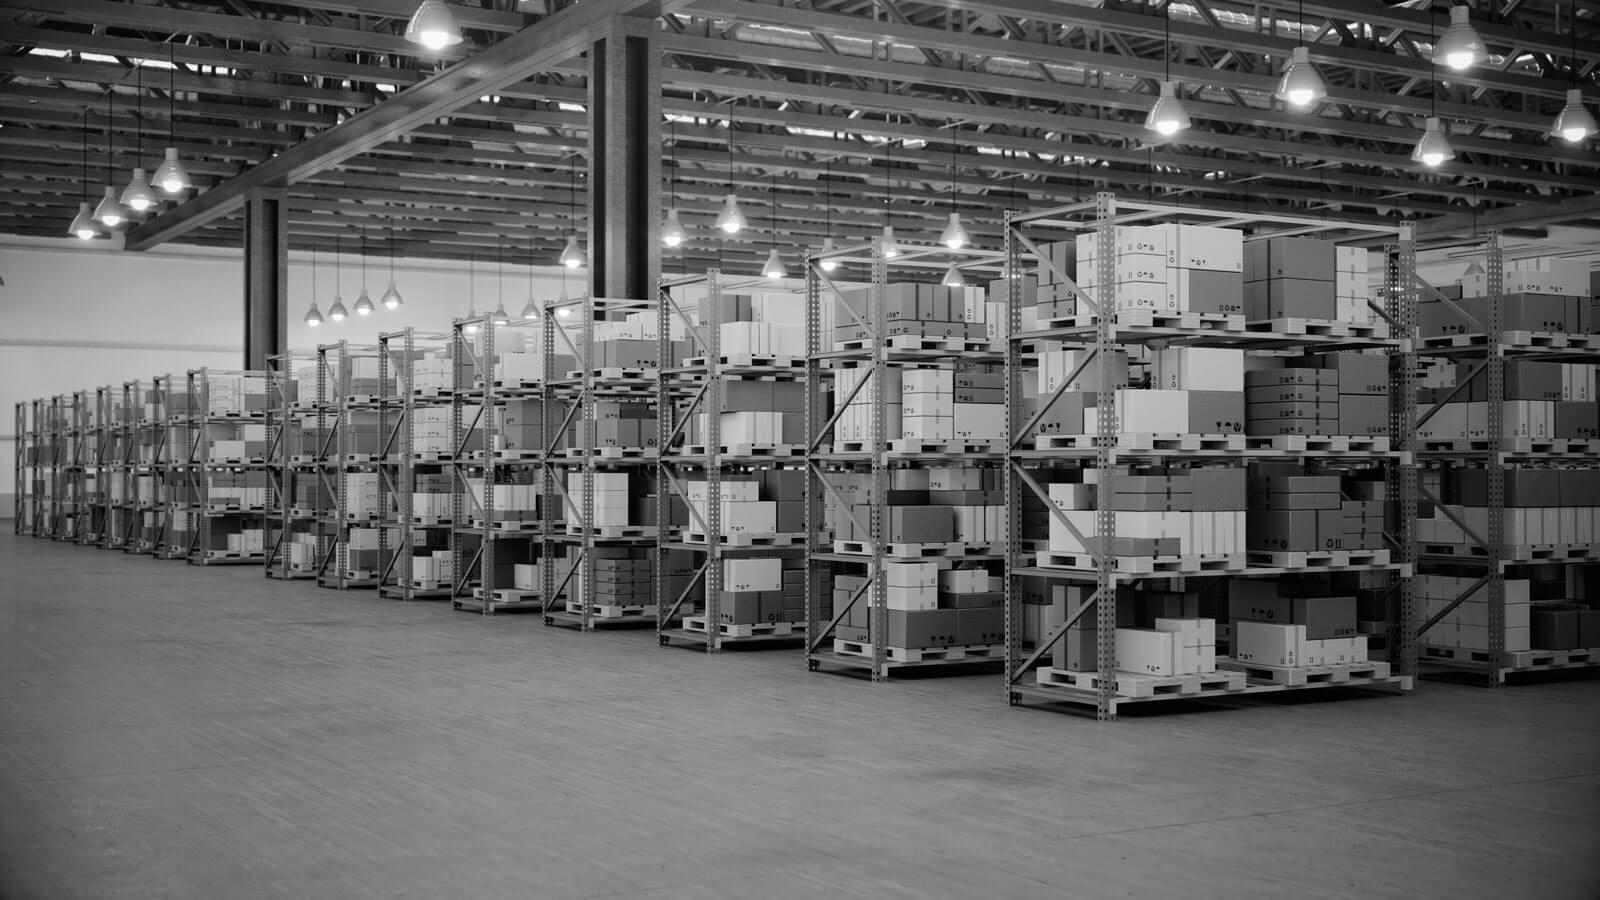 stock important-entrepôt-avec-boîtes-en carton-3262709652